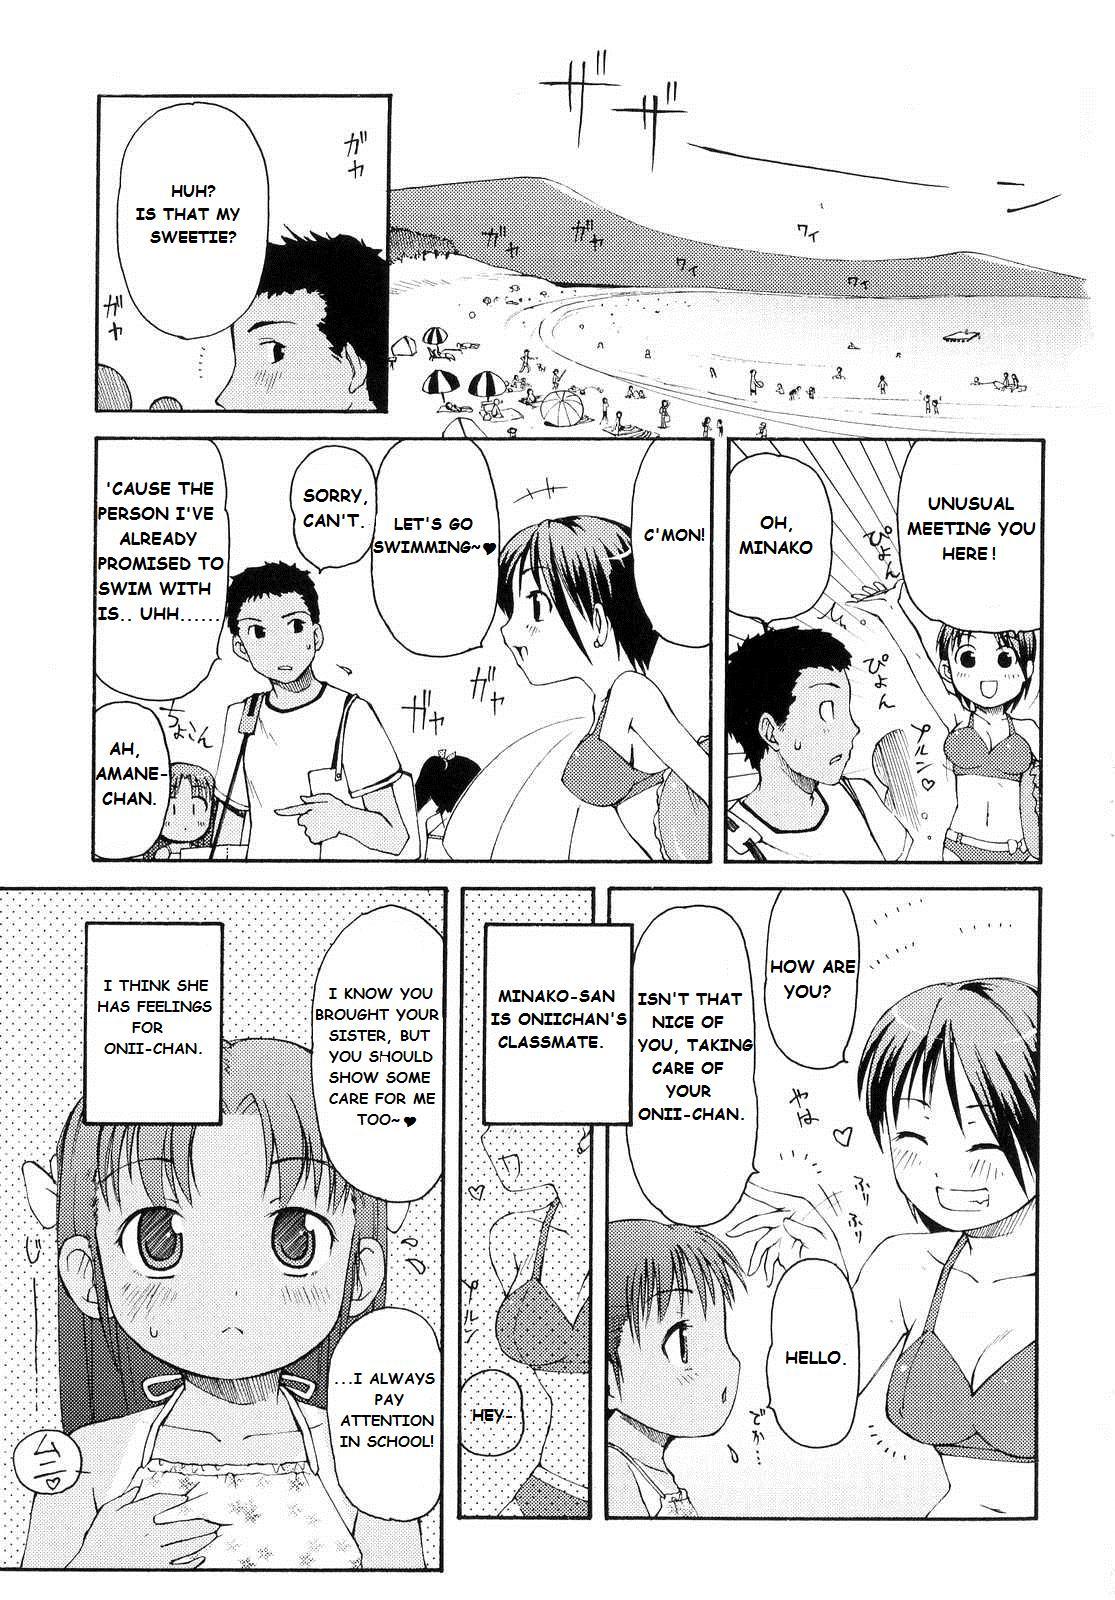 [LEE] Totsugeki Tonari no Onii-chan Ch. 1-7 [ENG] 7